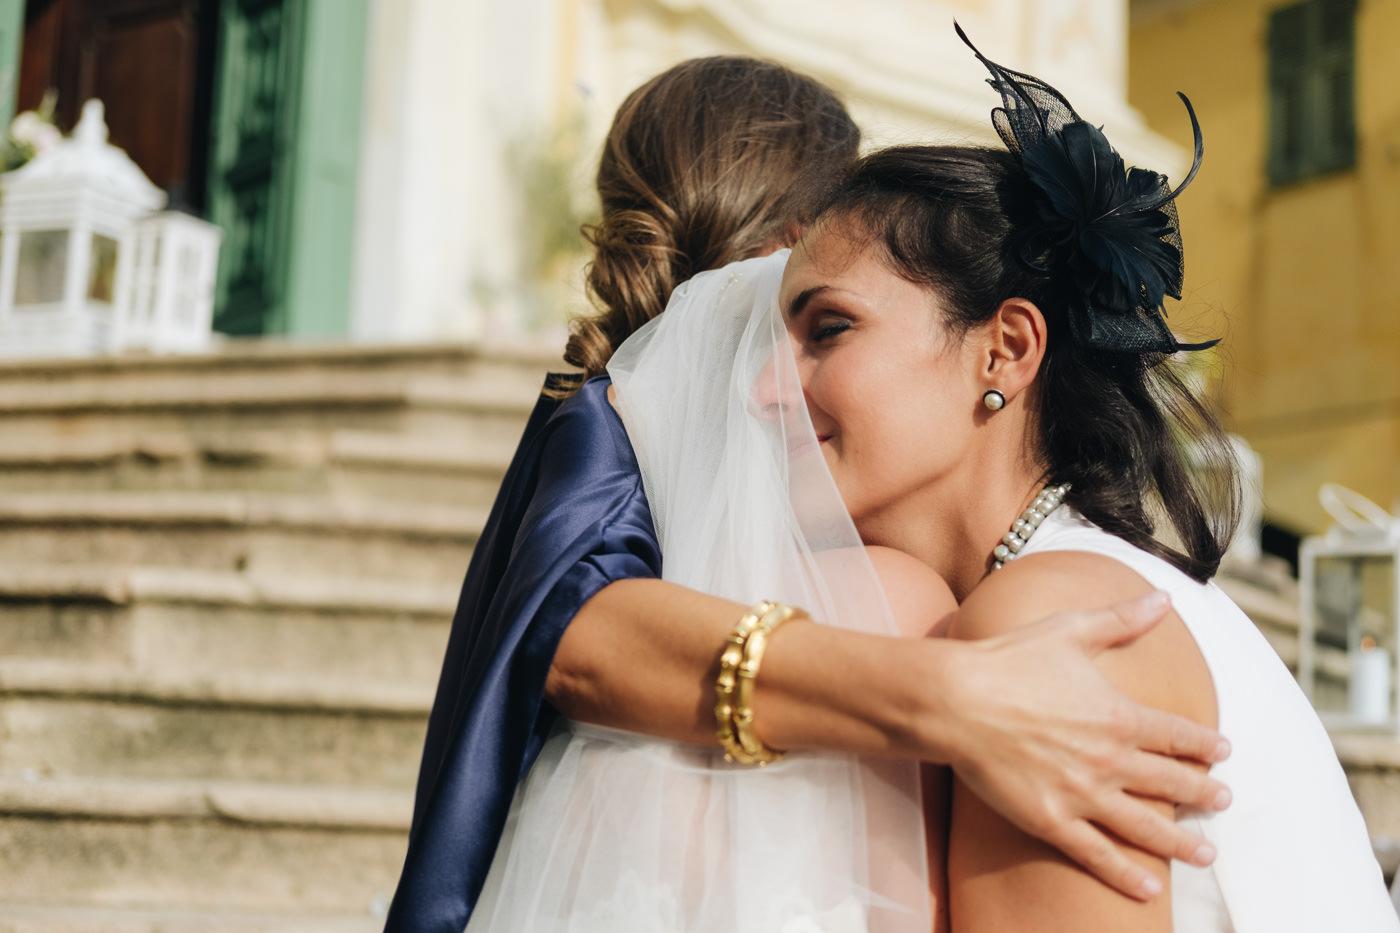 matrimoni_all_italiana_fotografo_matrimonio_cinque_terre-35.jpg